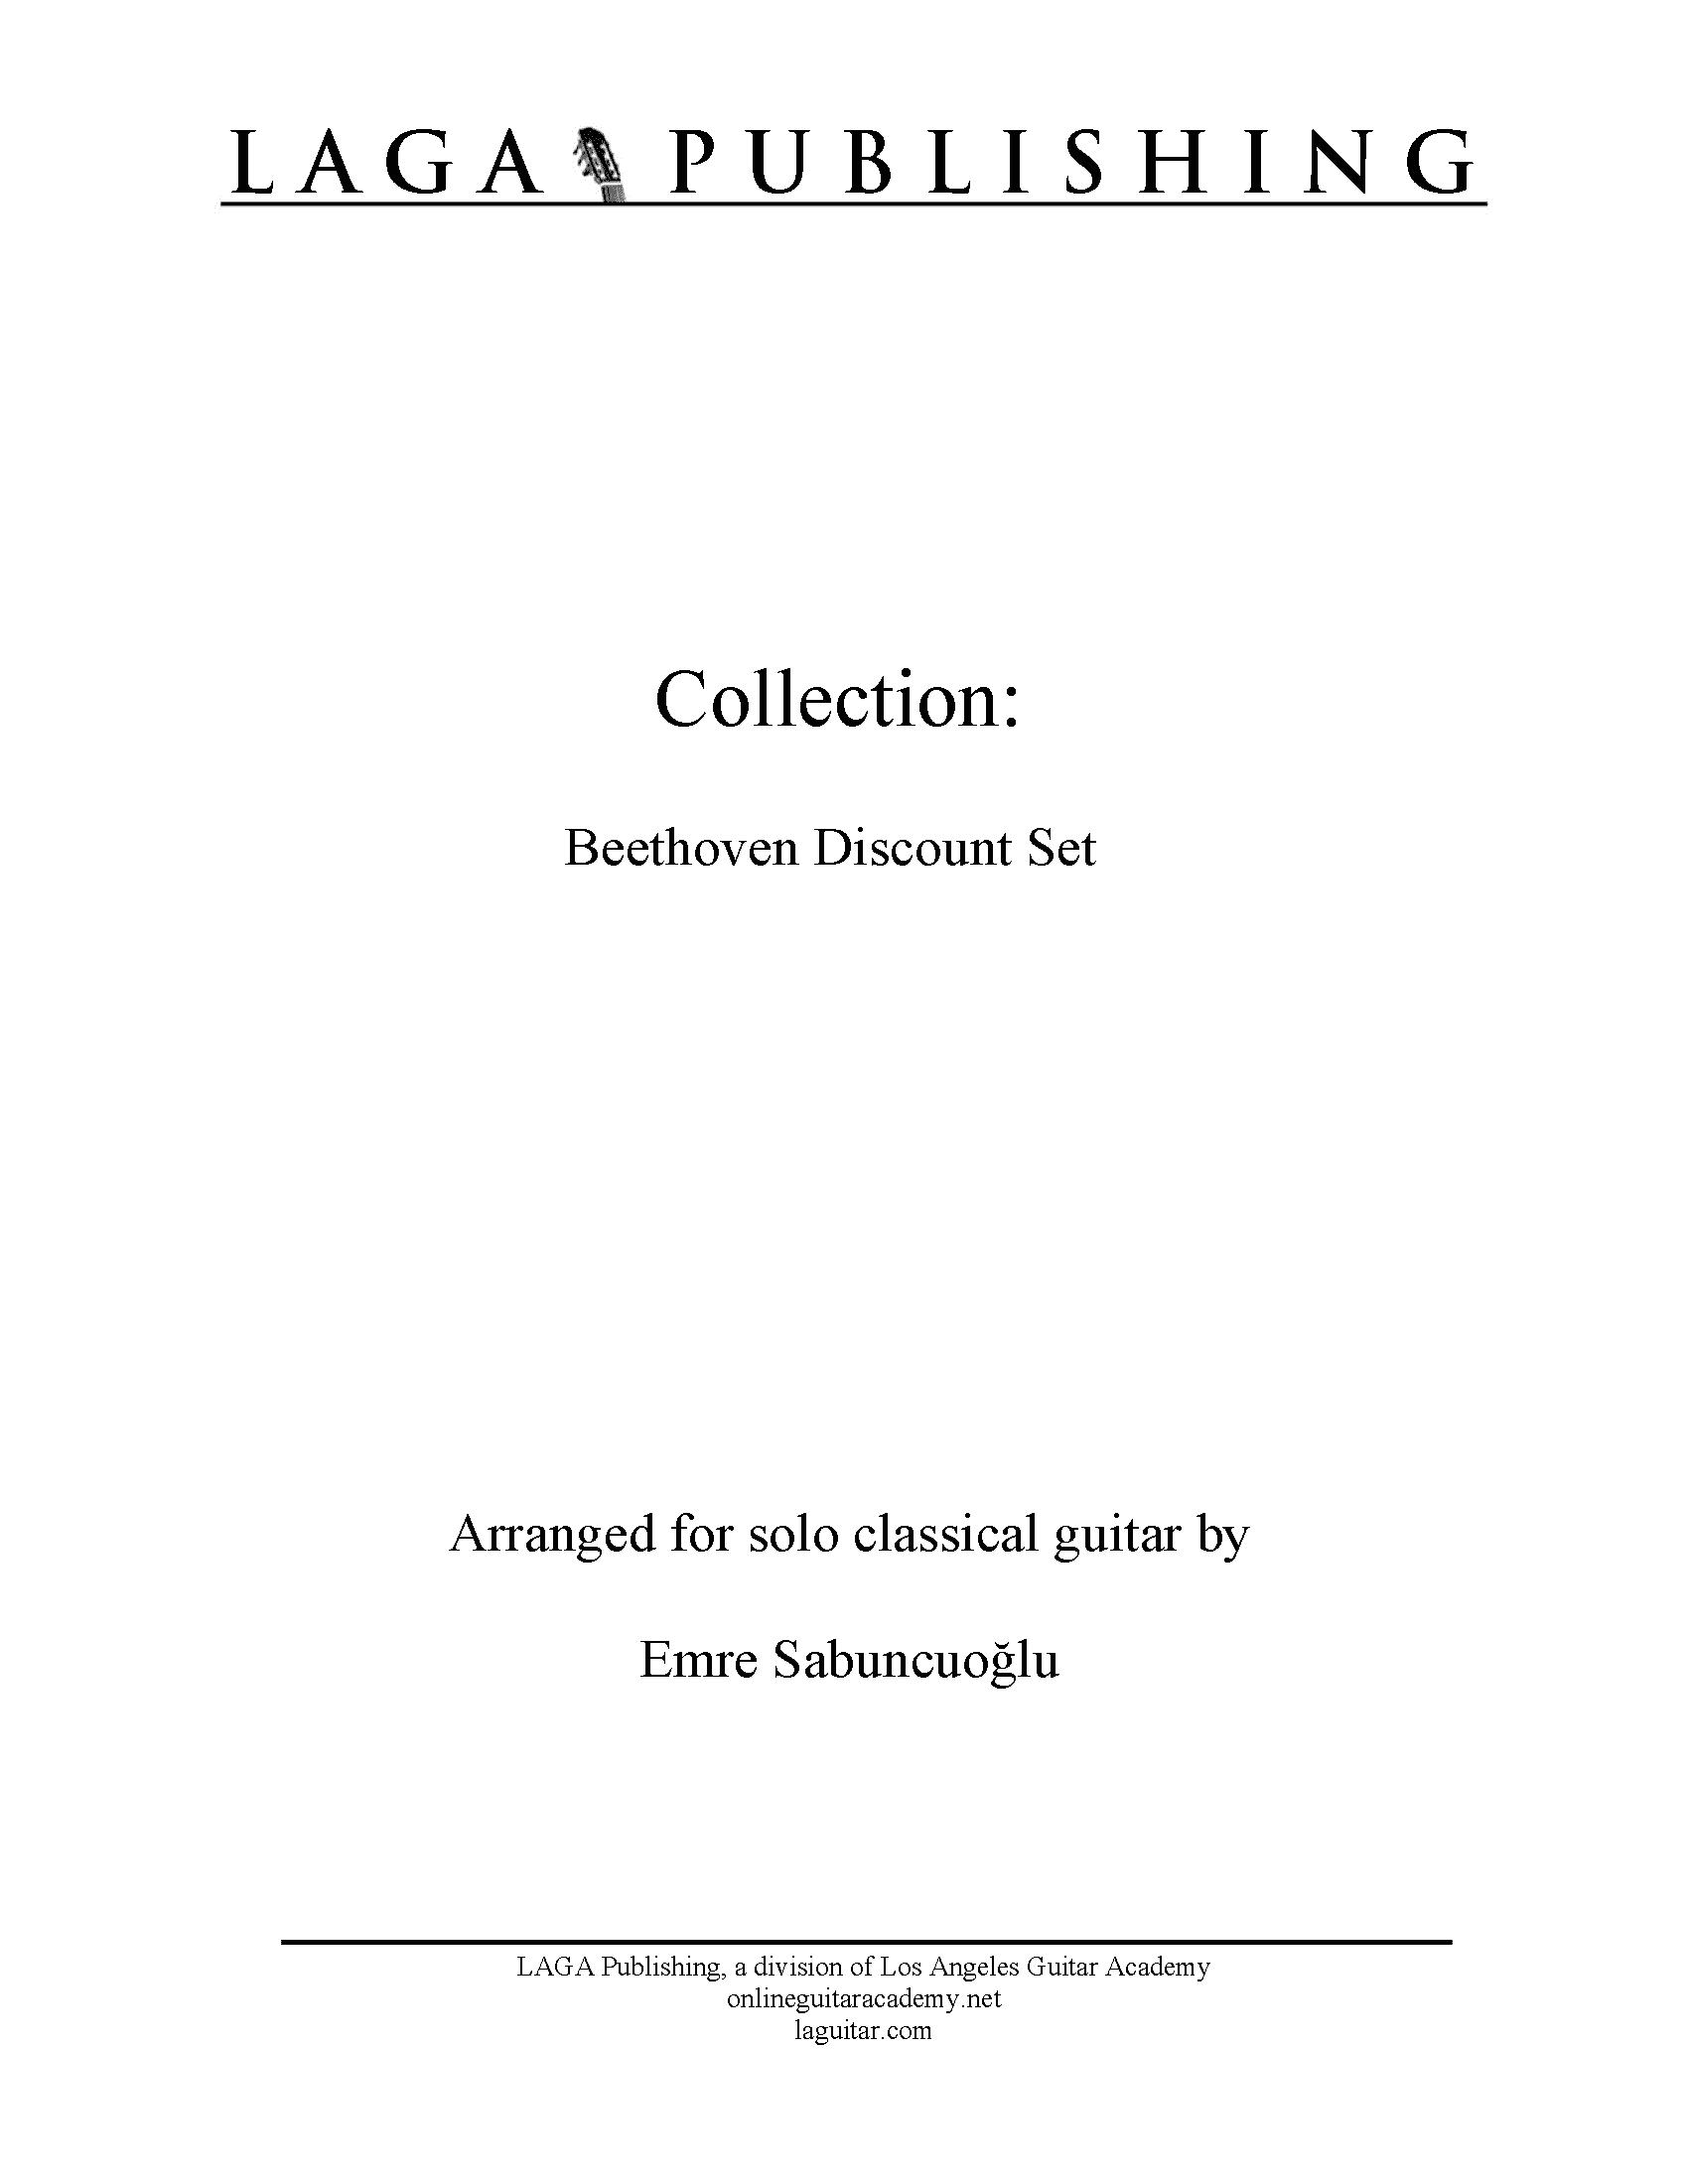 Beethoven Discount set